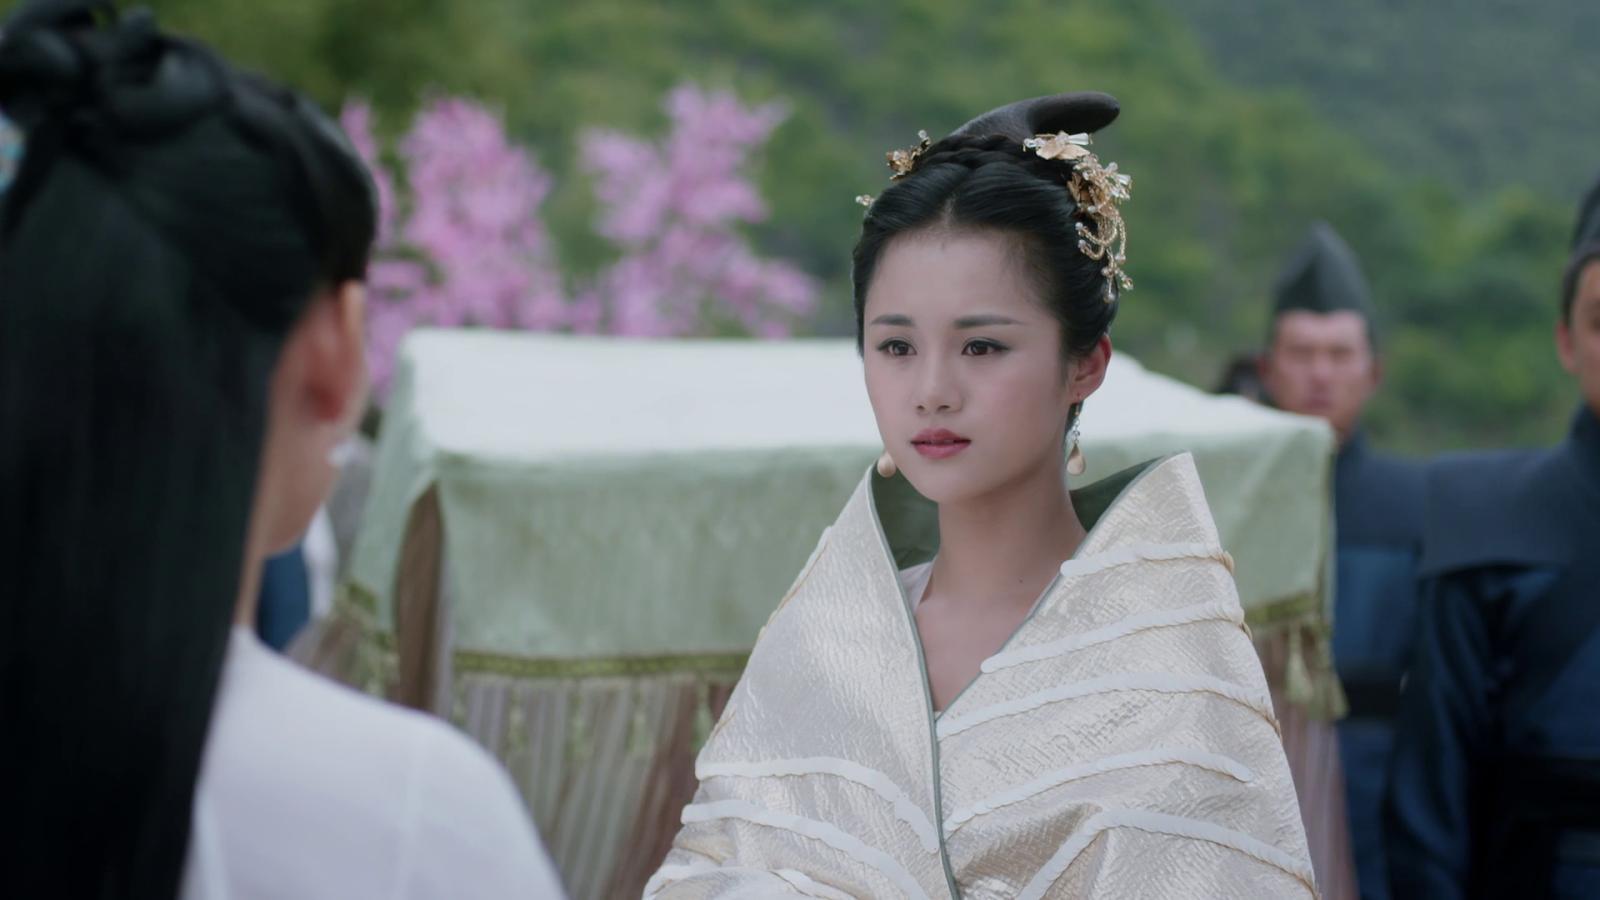 Ten Miles of Peach Blossoms 三生三世十里桃花 - Episode 29